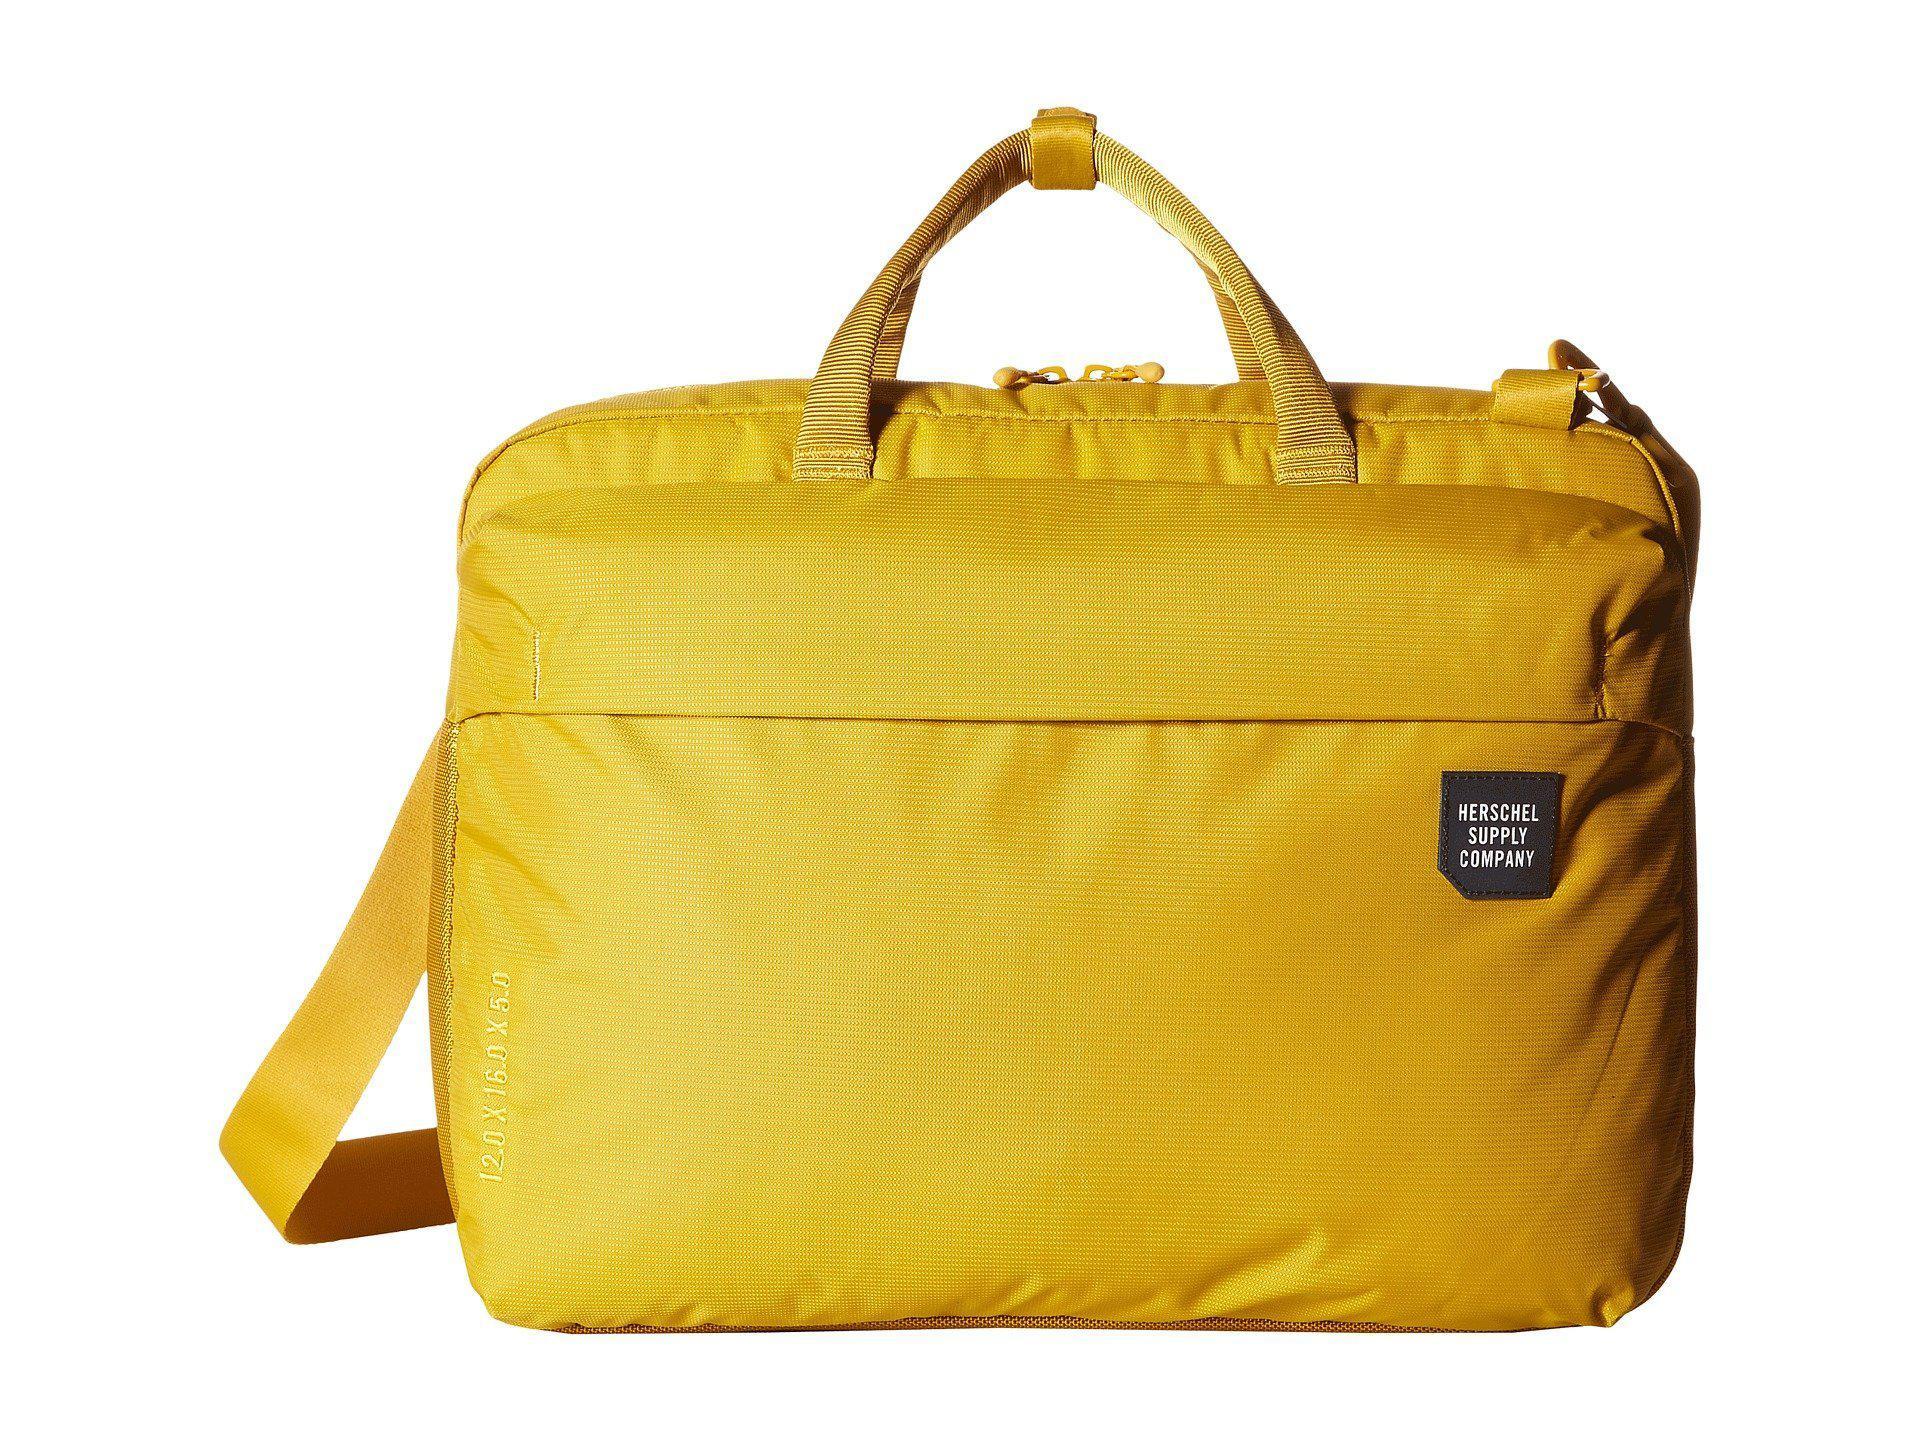 282ed7a0b7 Lyst - Herschel Supply Co. Britannia (arrowwood) Messenger Bags in ...